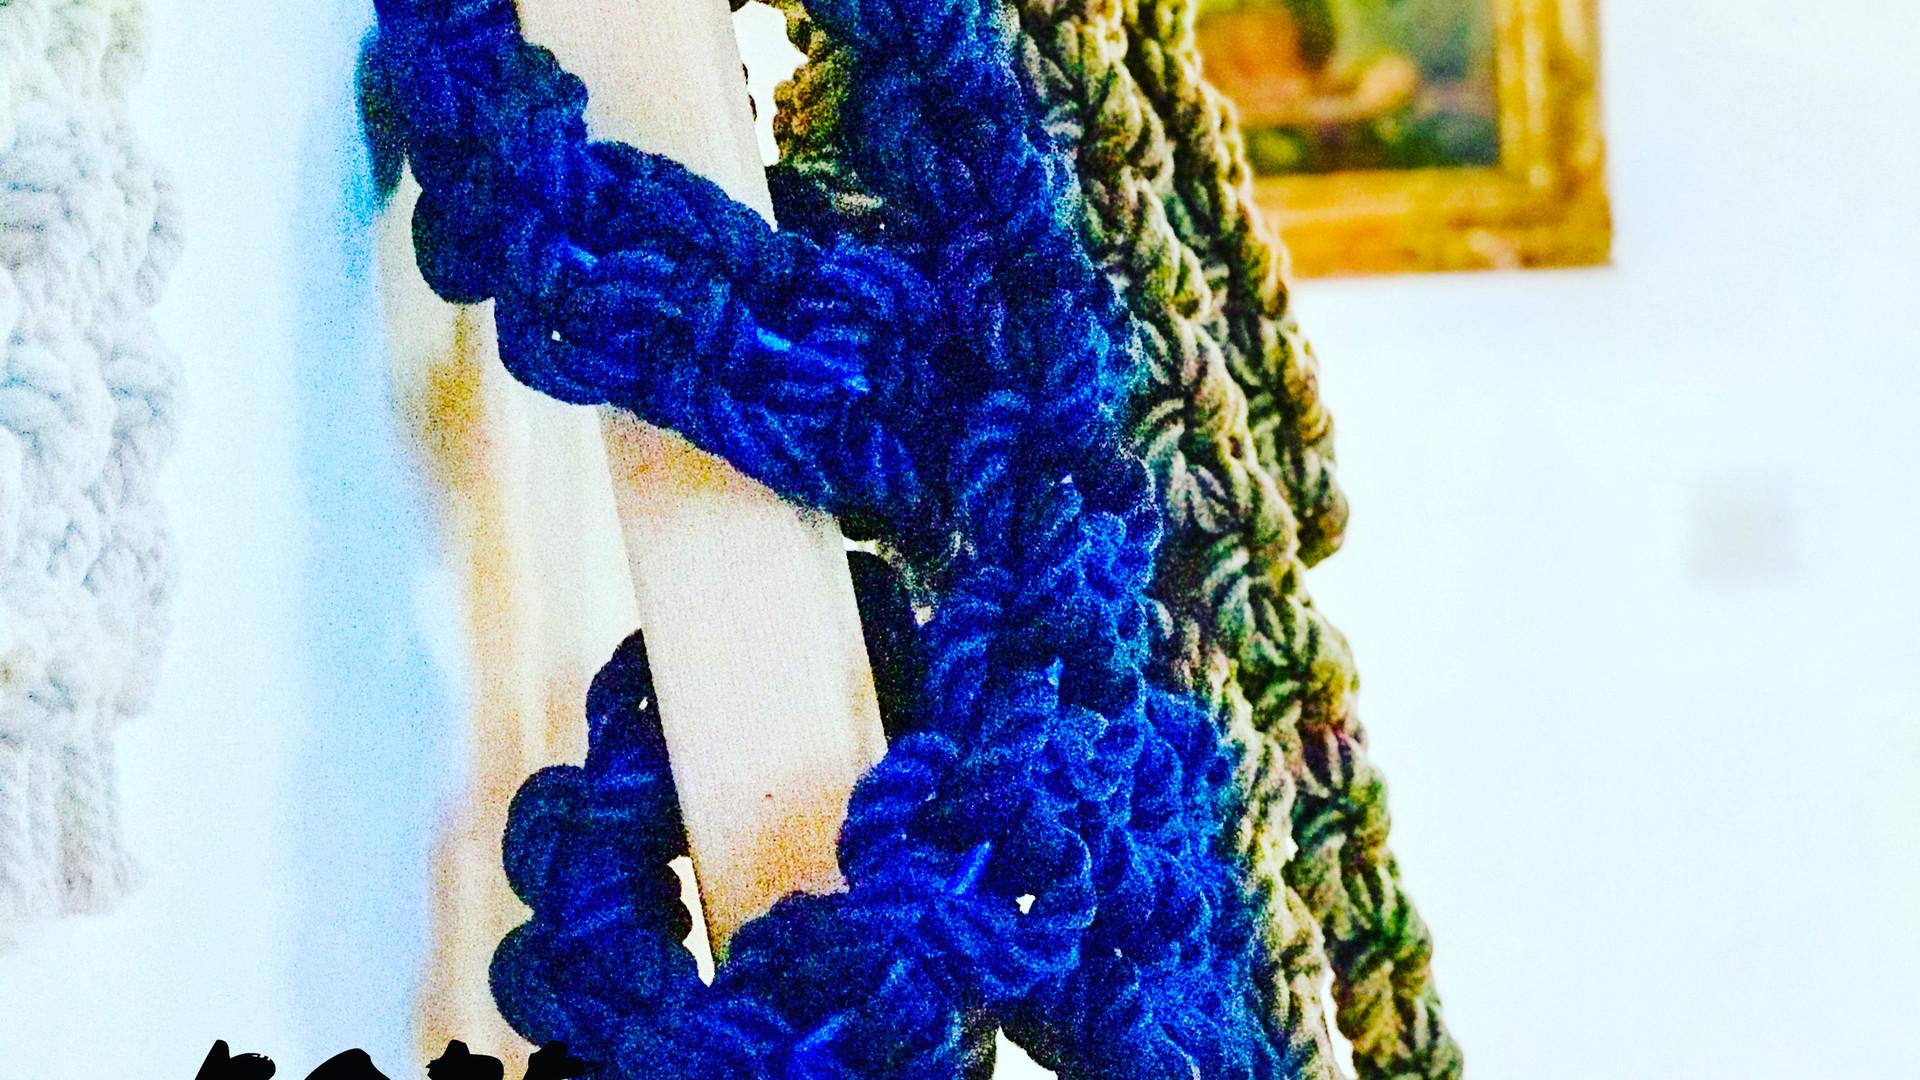 Lighty Blue Navy 3 £400